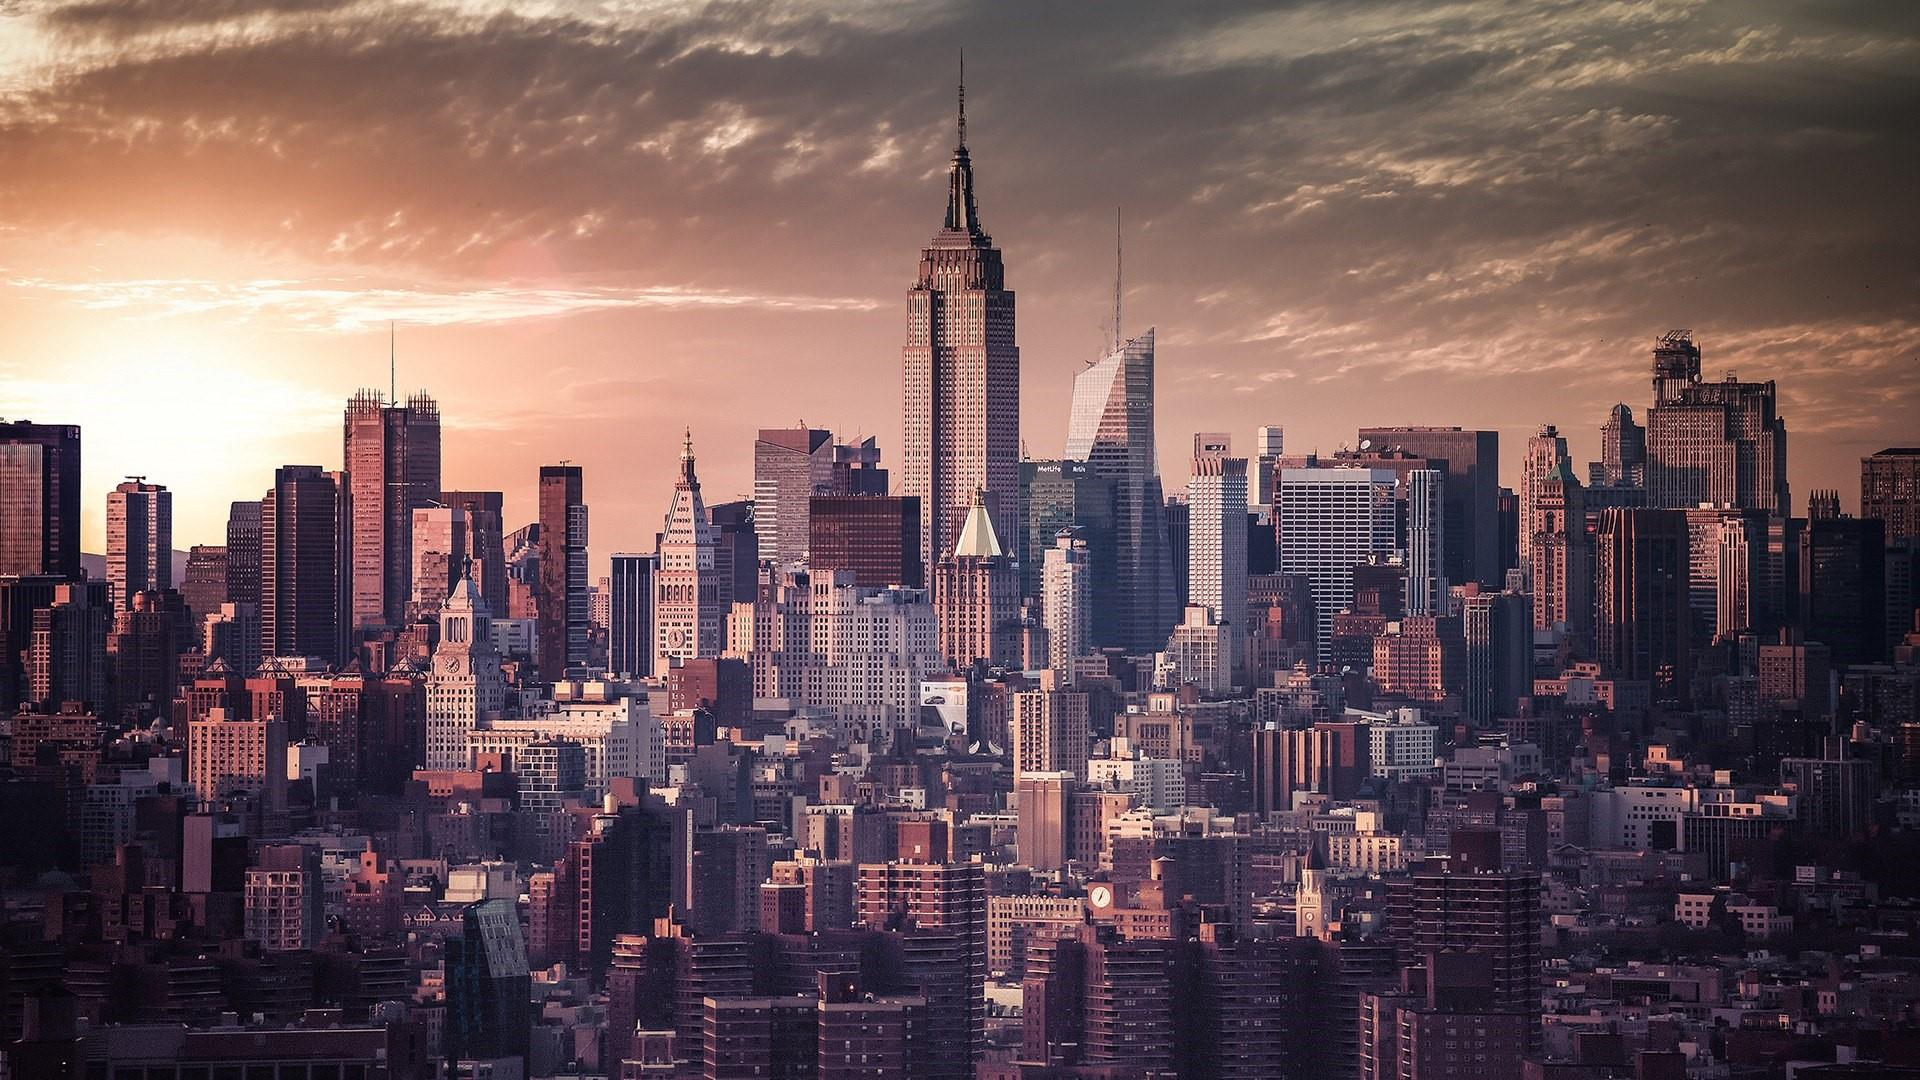 Manhattan Skyline (New York City) wallpaper